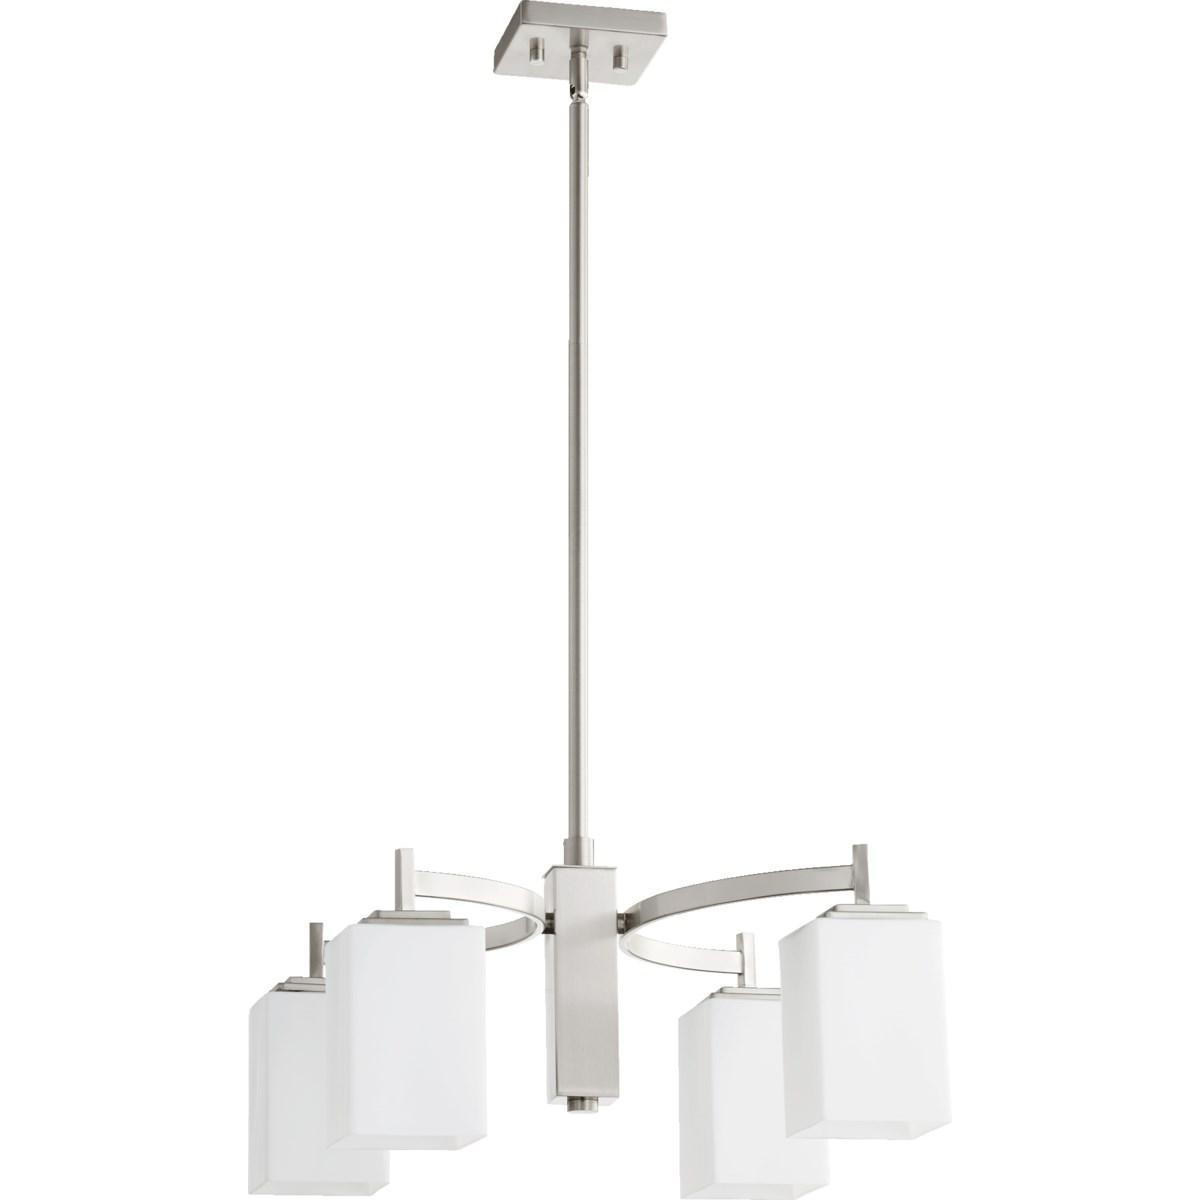 Delta 4 Light Modern and Contemporary Satin Nickel Chandelier